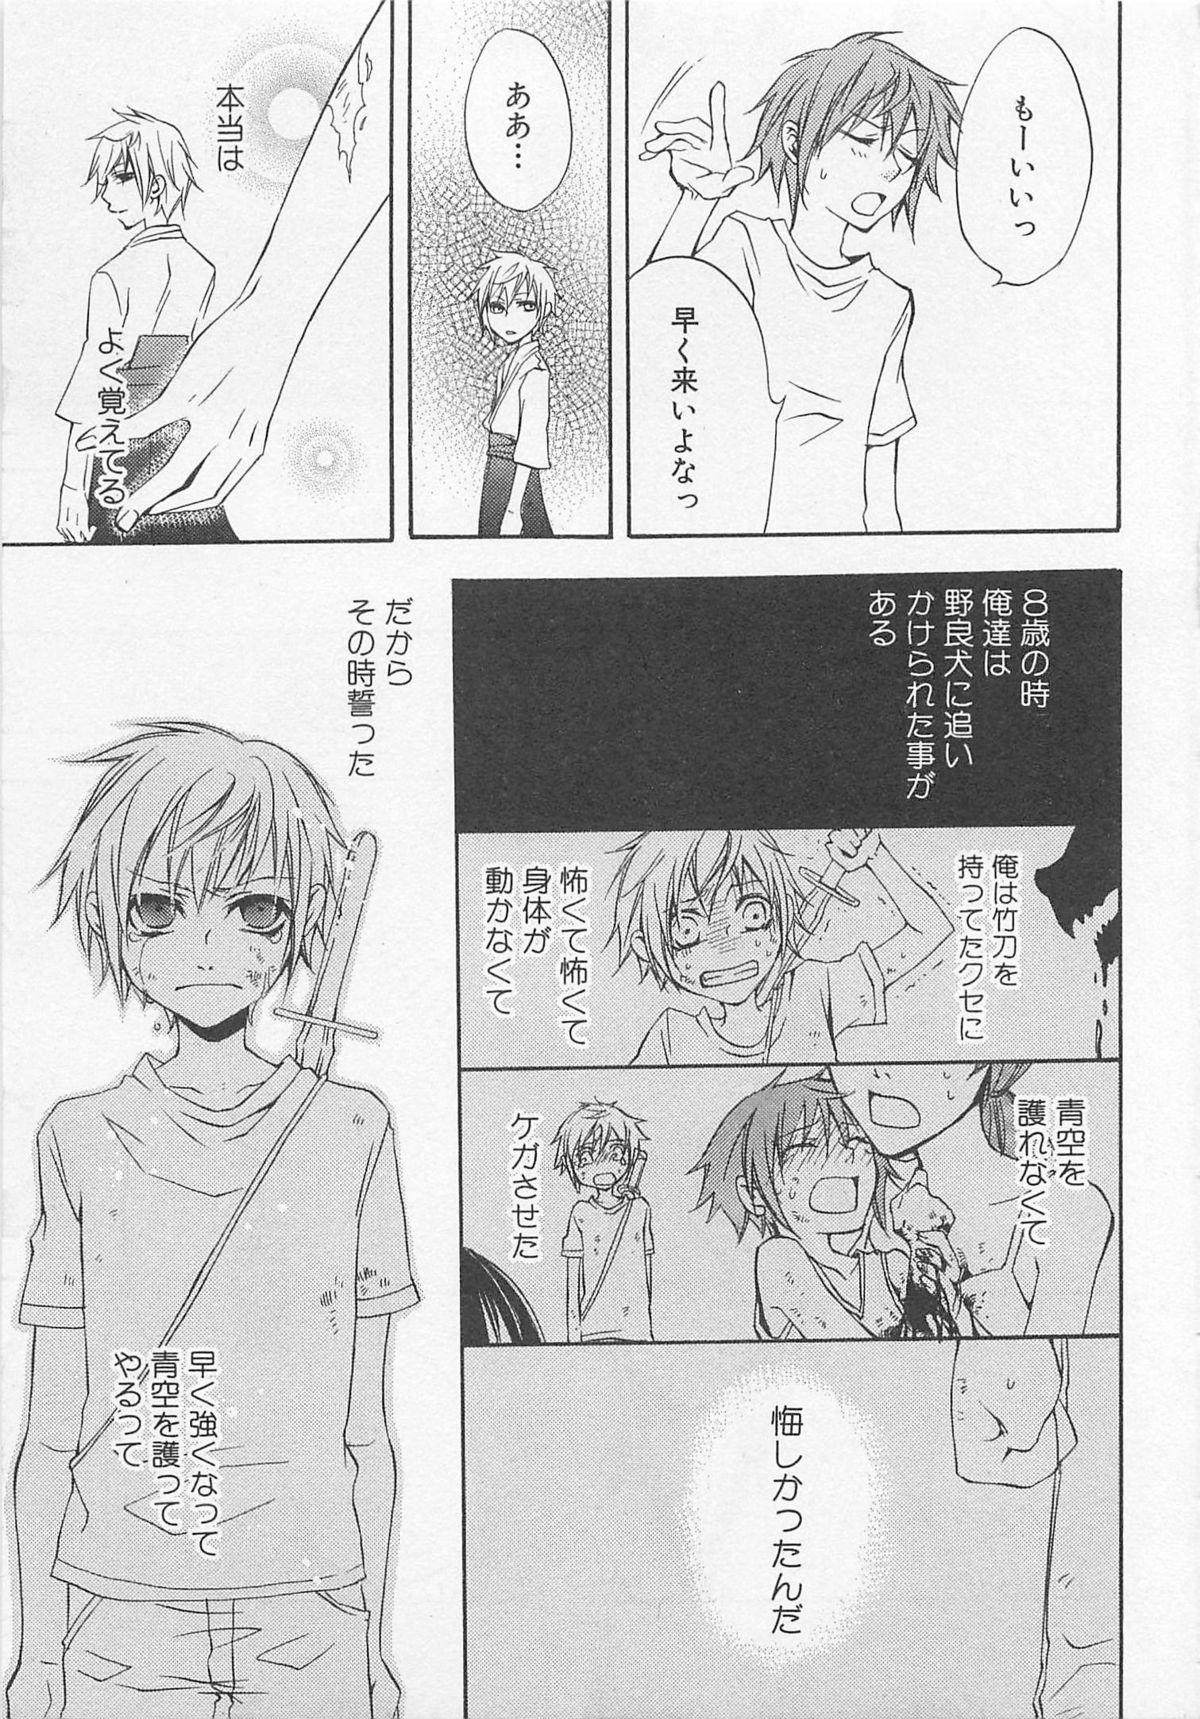 Shounentachi Vol. 2 15